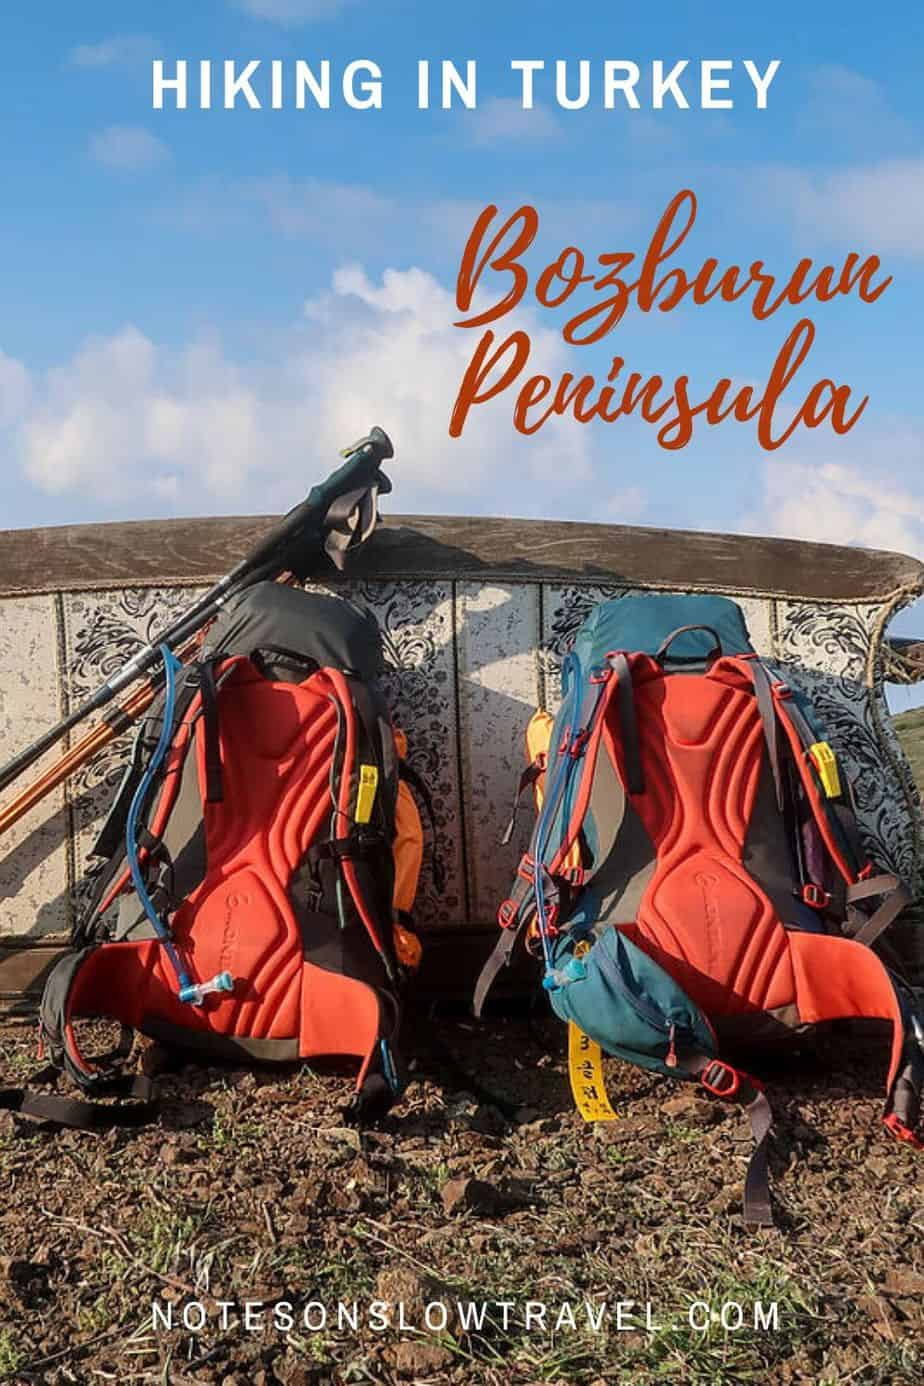 Hiking the Bozburun Peninsula, Carian Trail Turkey